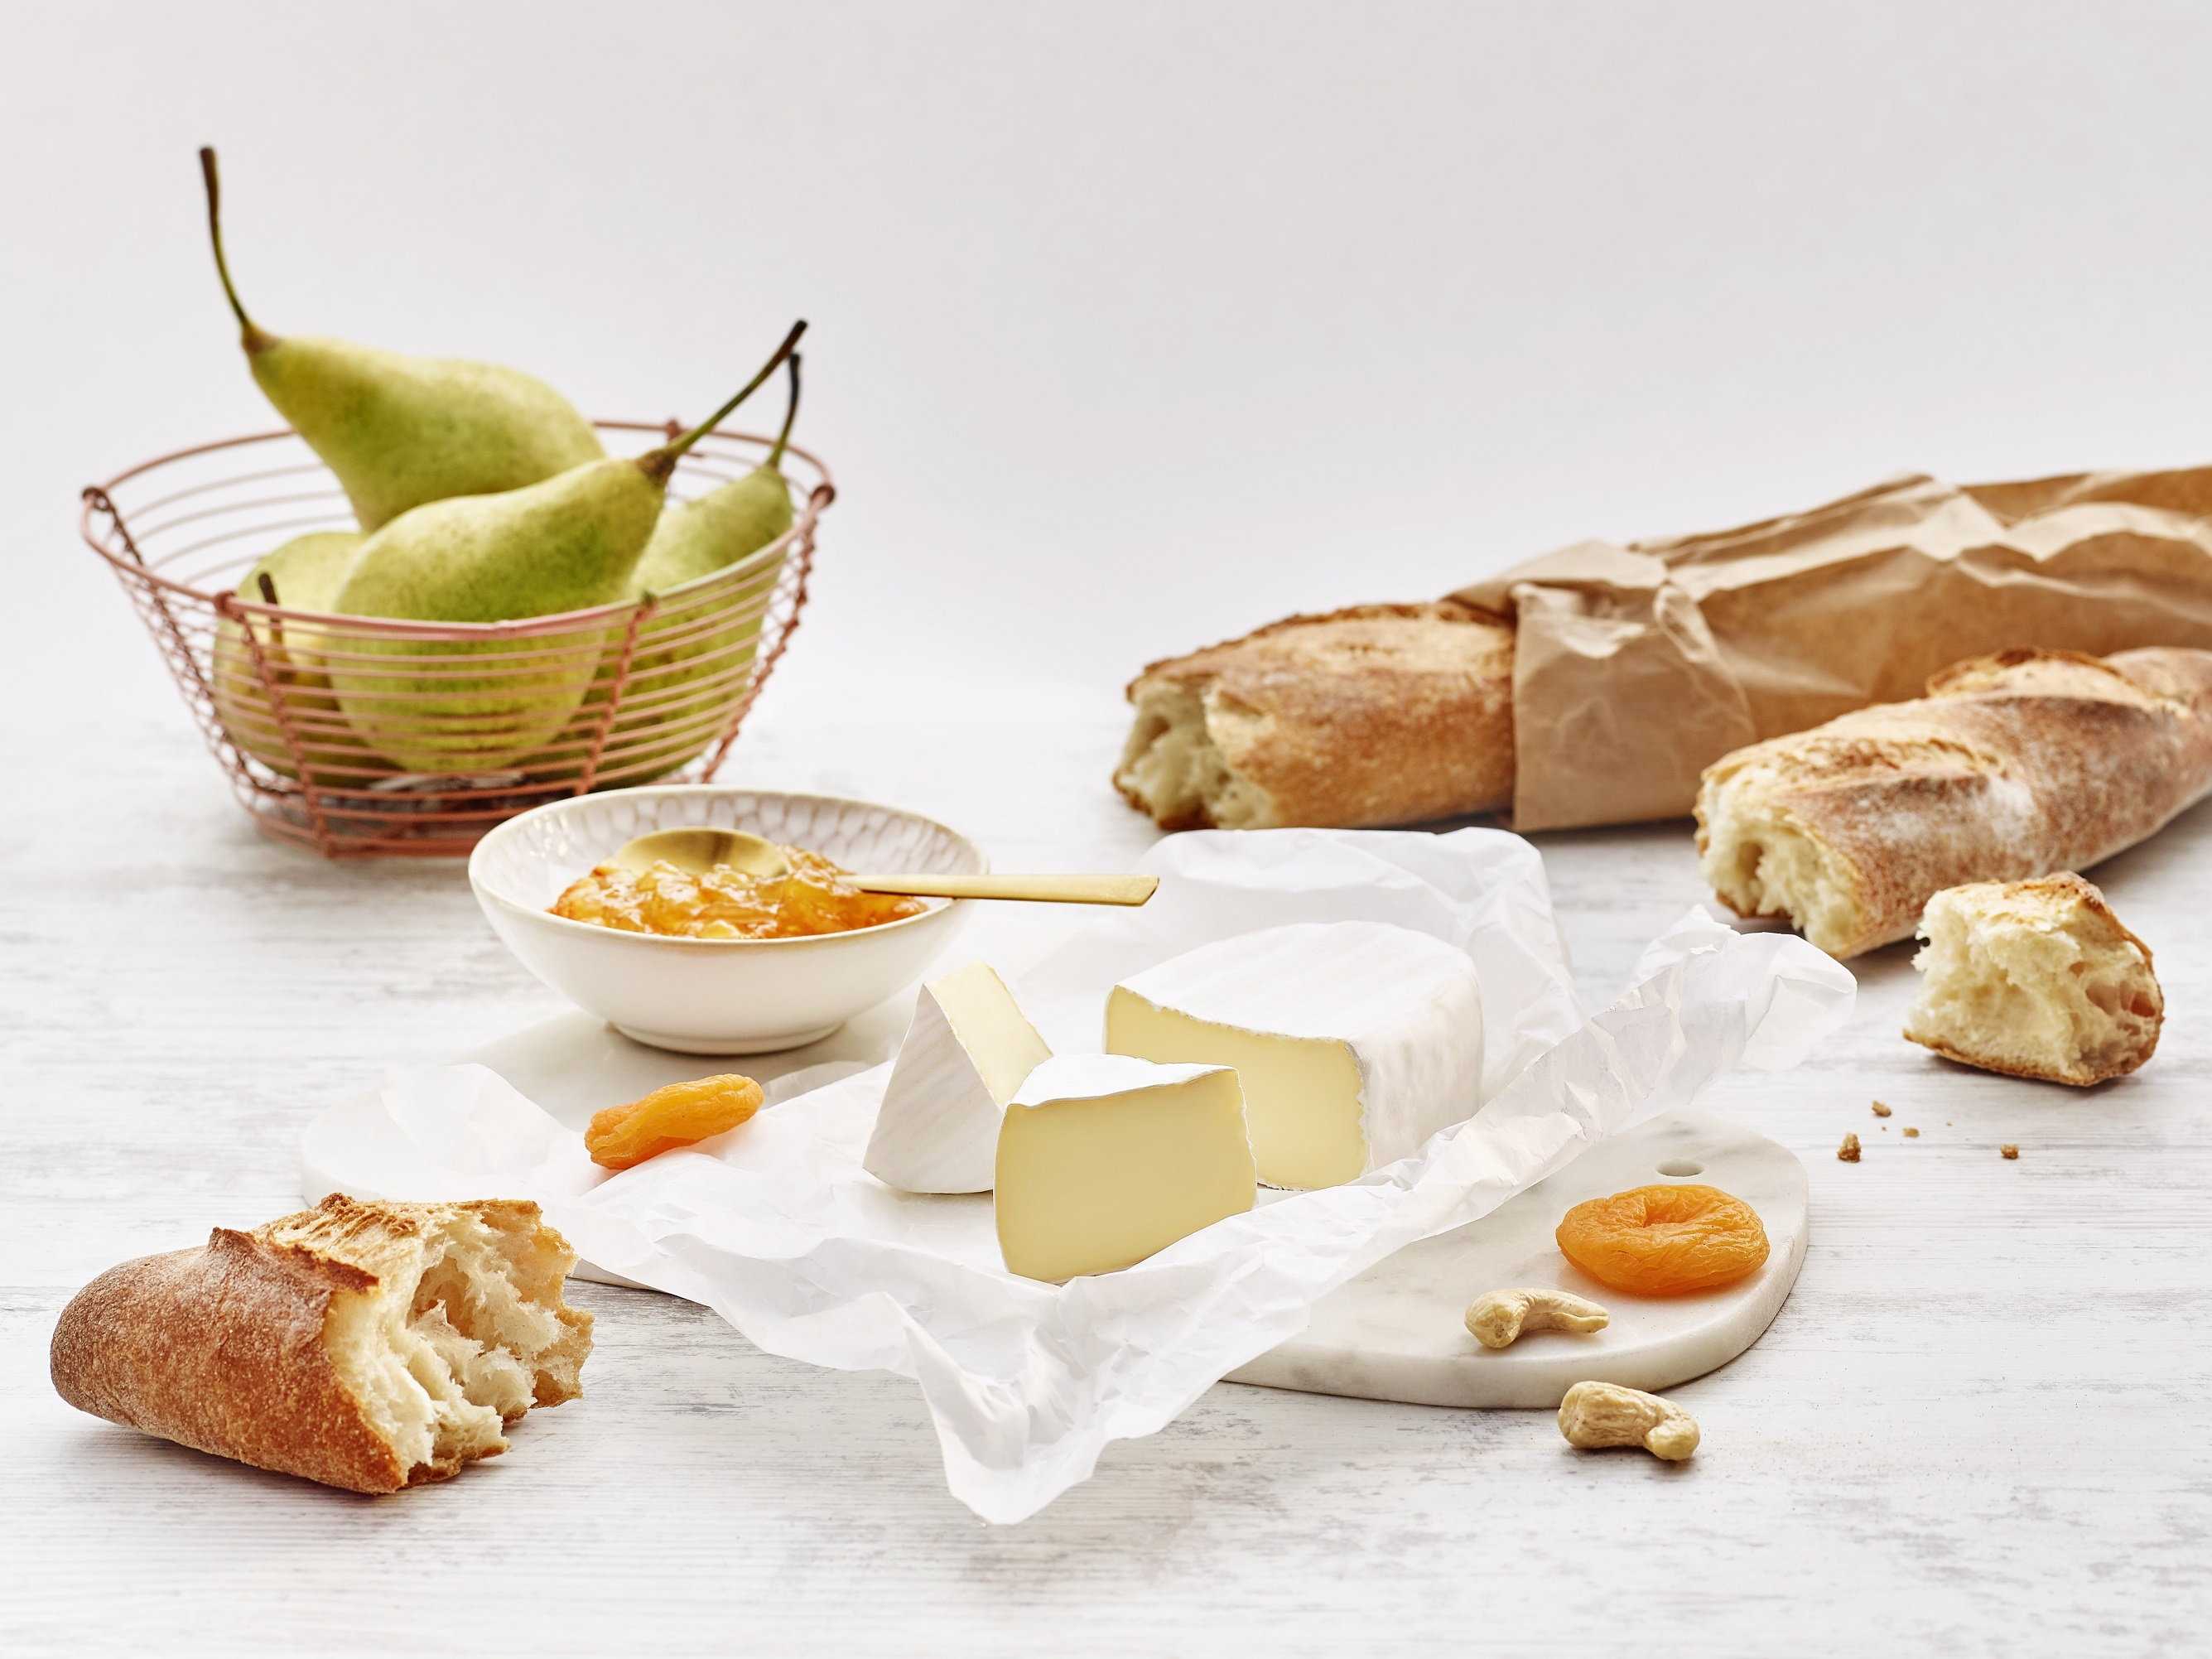 Valbon – spotkania z klasyką smaku, każdego dnia